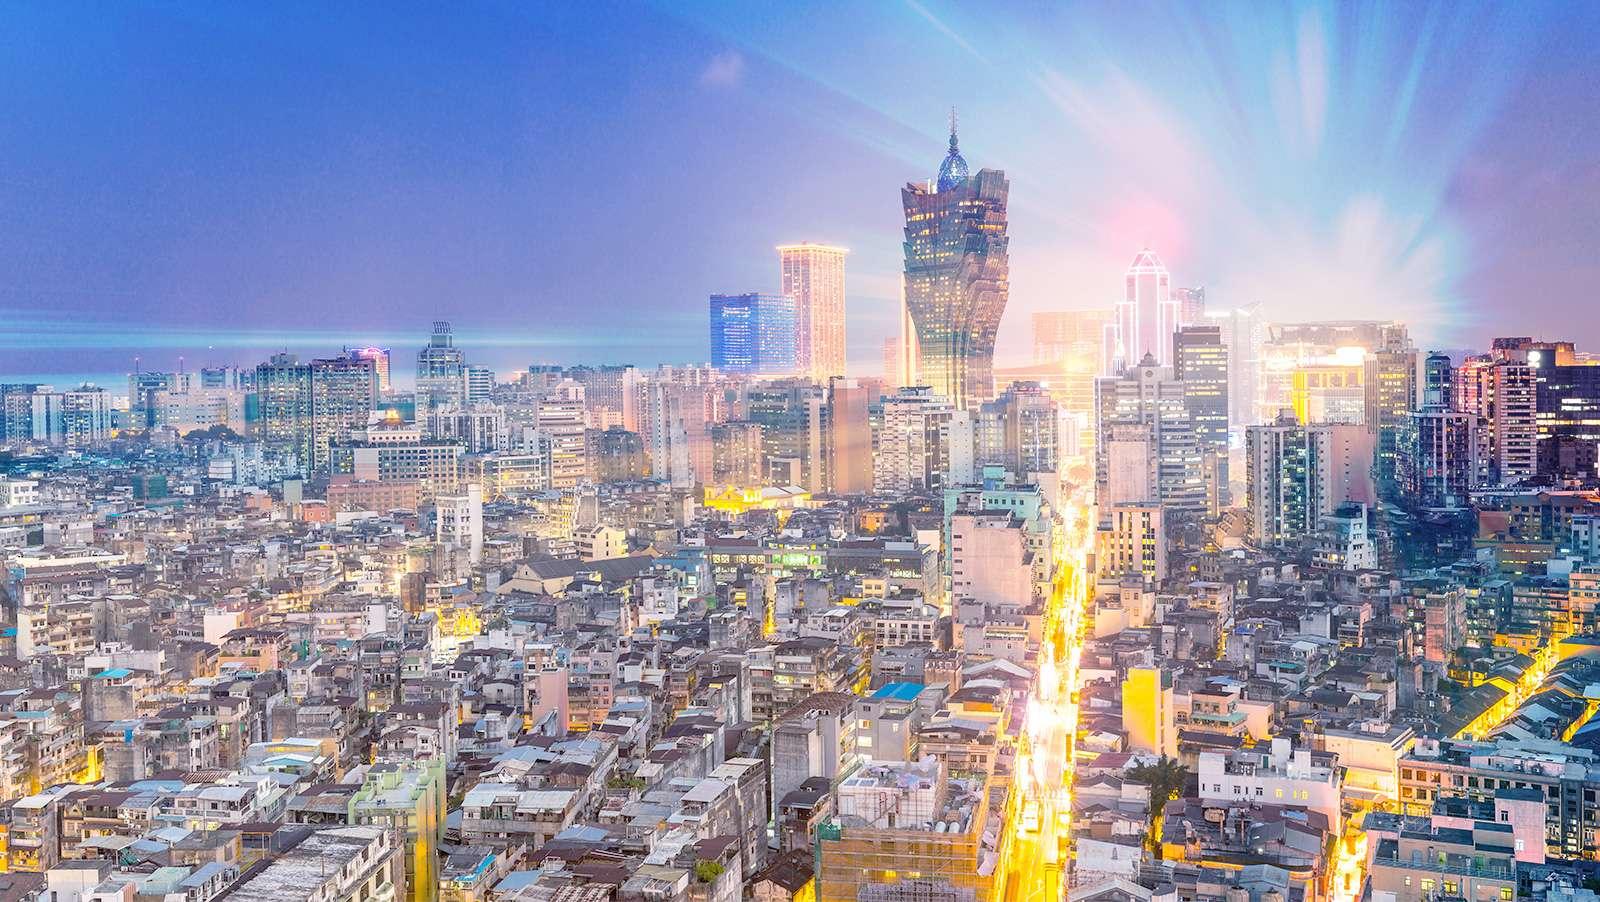 DeClub Macau wants to build the world's first blockchain casino